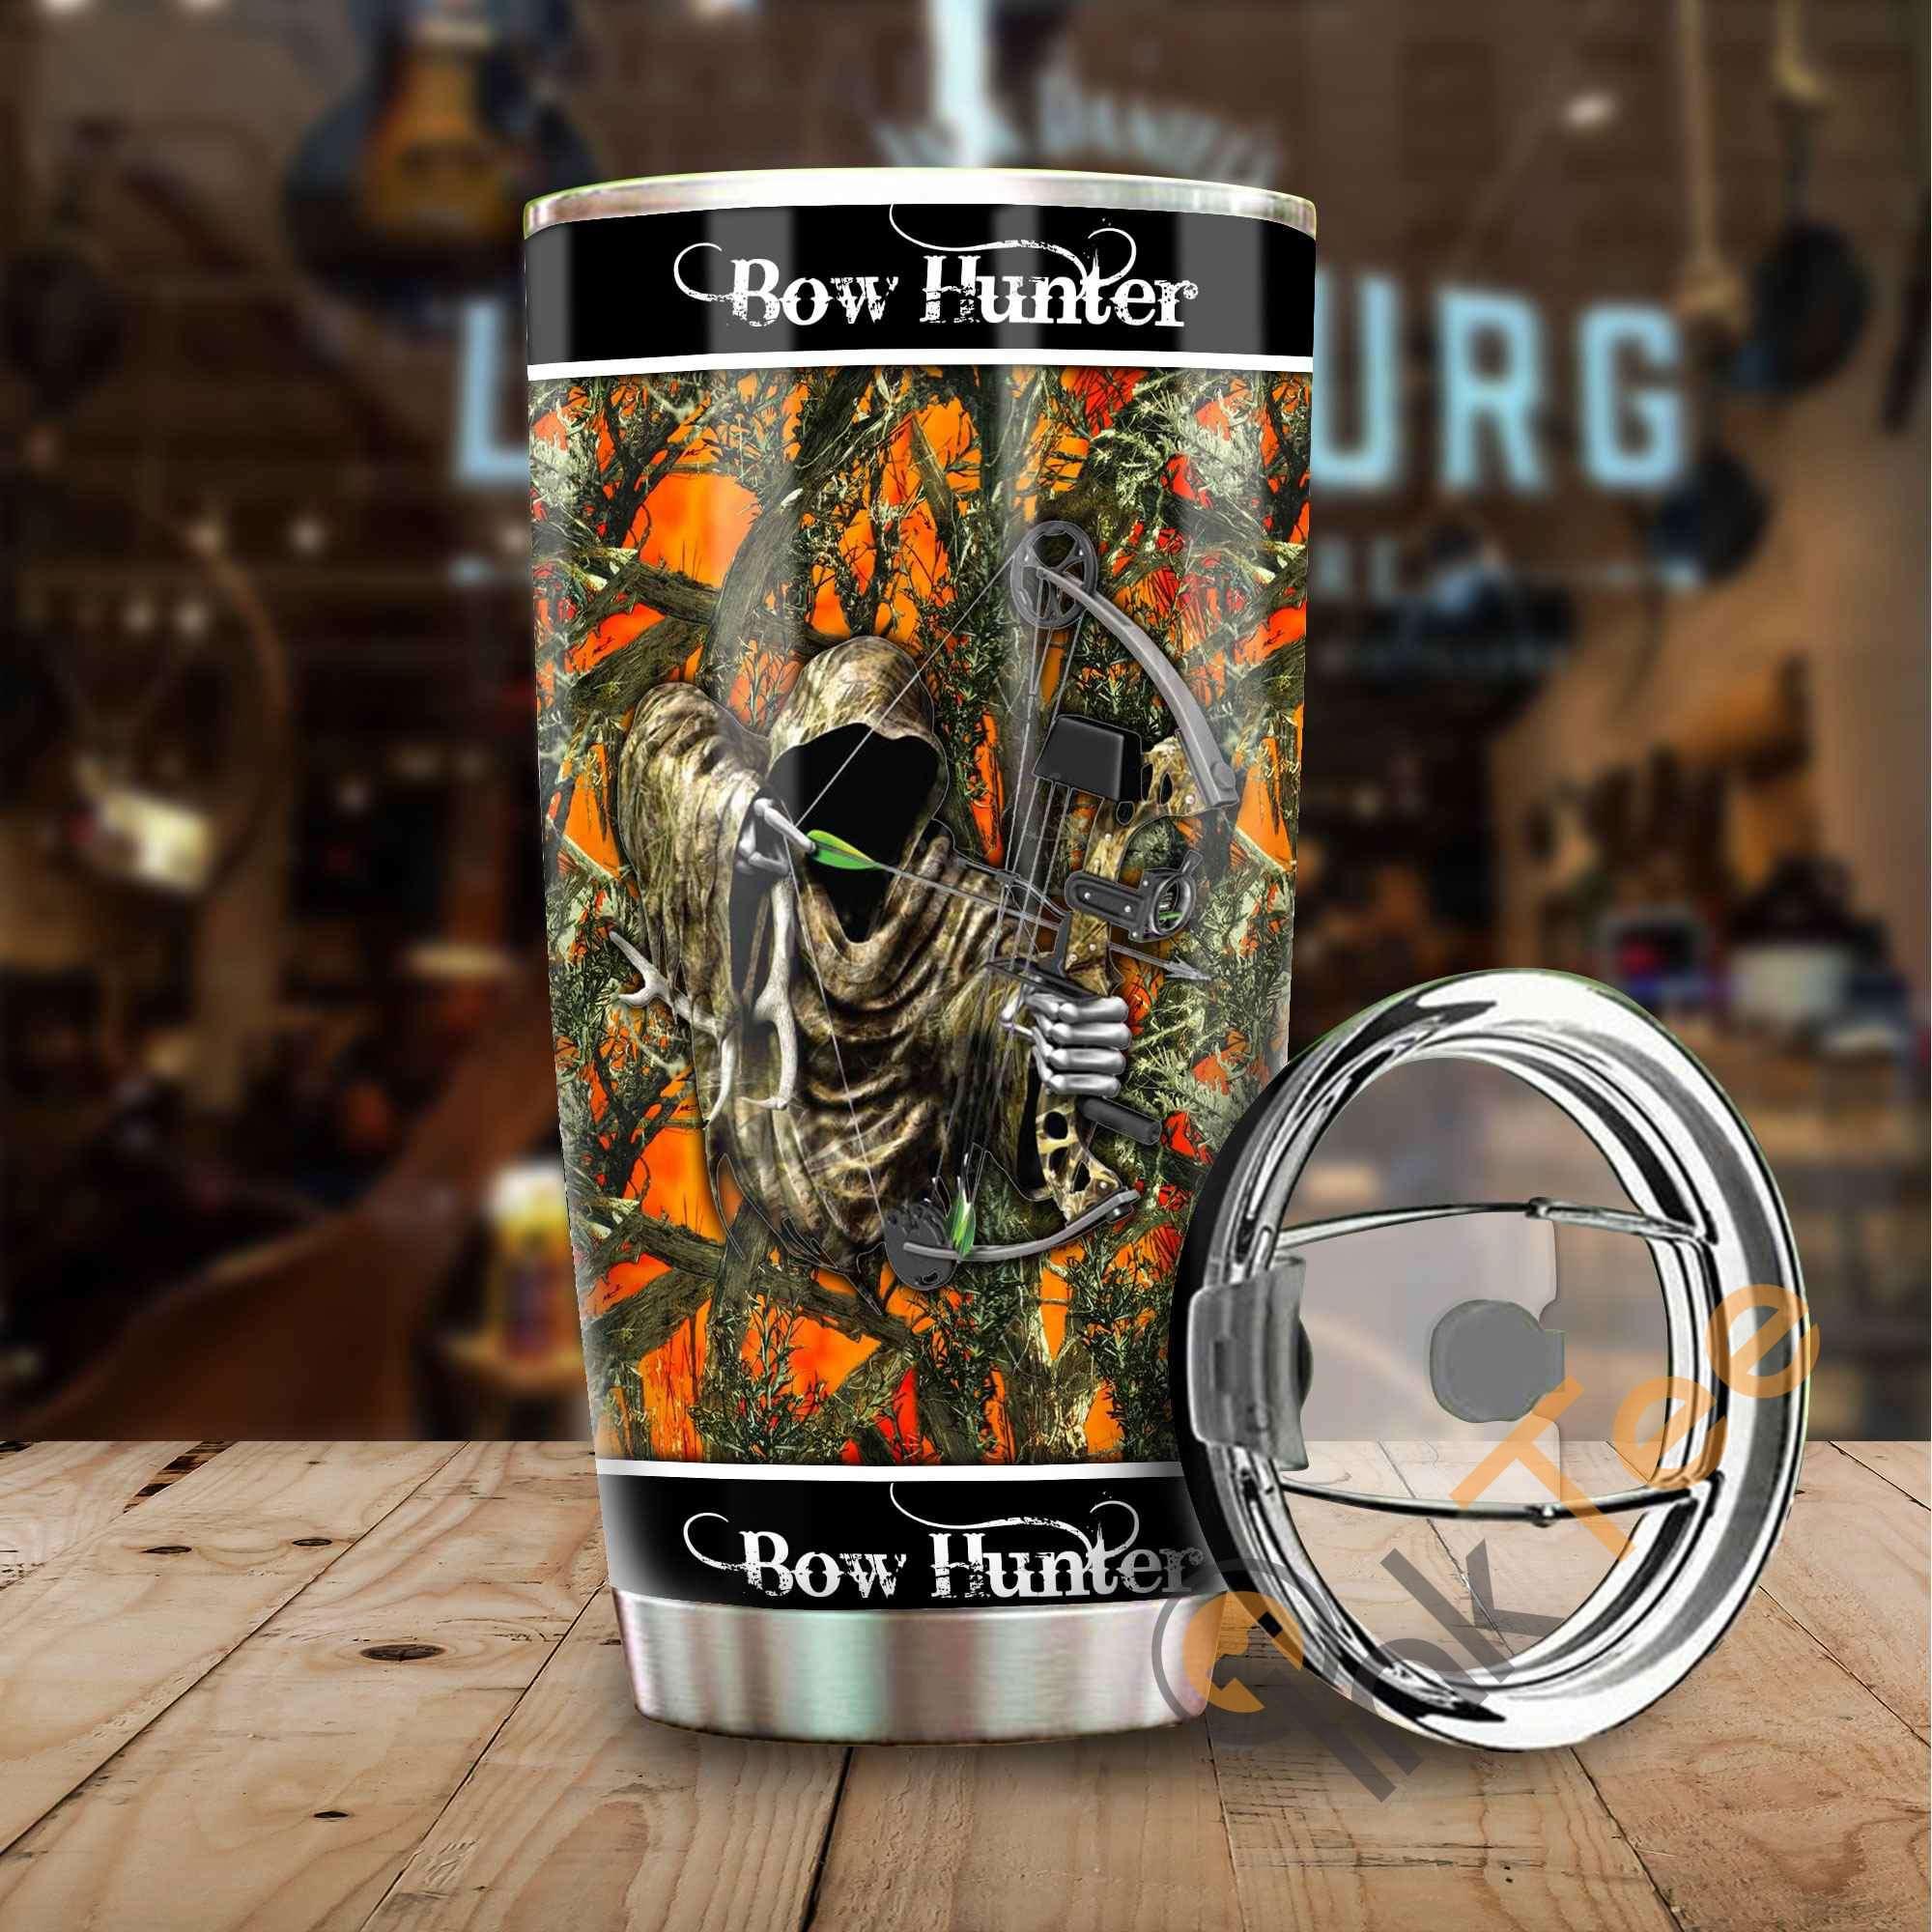 Bow Hunting Amazon Best Seller Sku 2621 Stainless Steel Tumbler